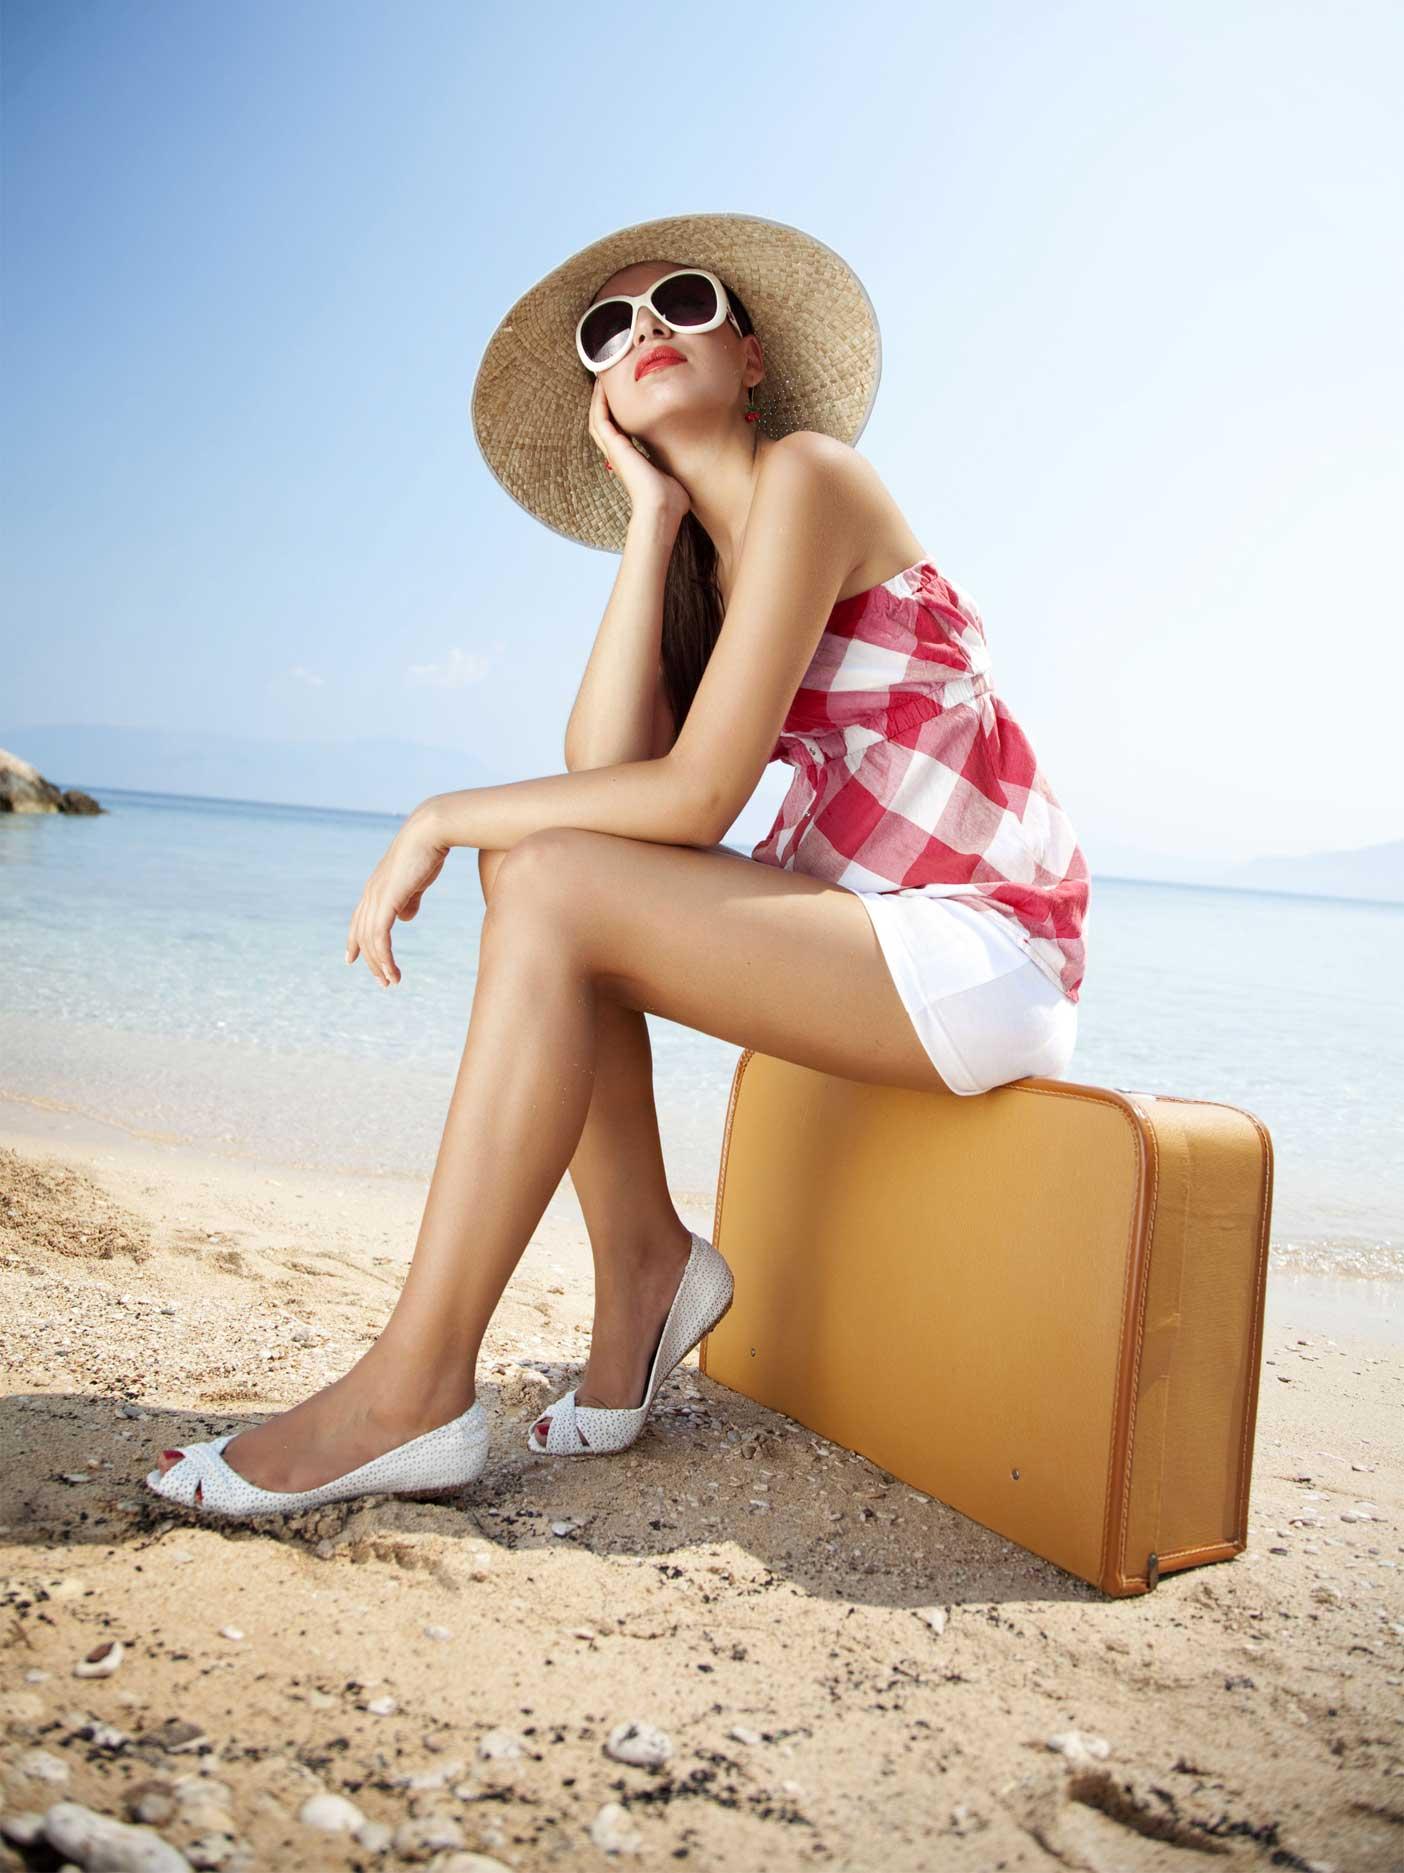 Tourist traveler on background view mockup